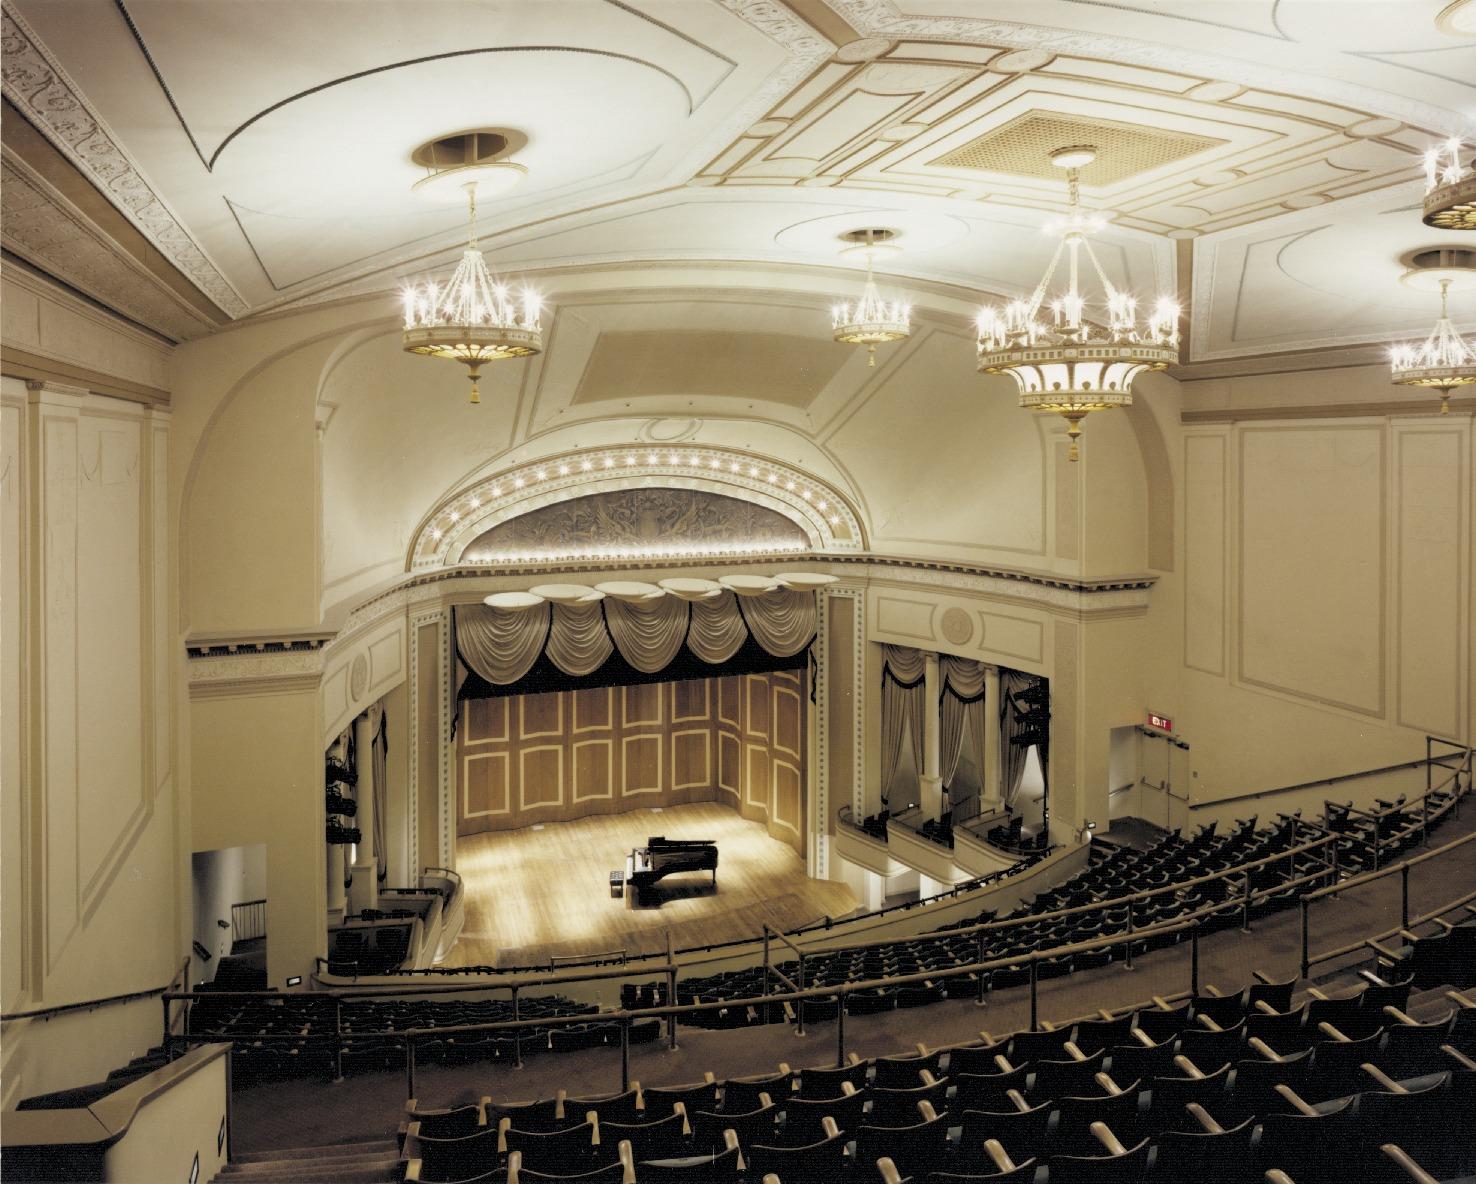 Folly Theater Bnim